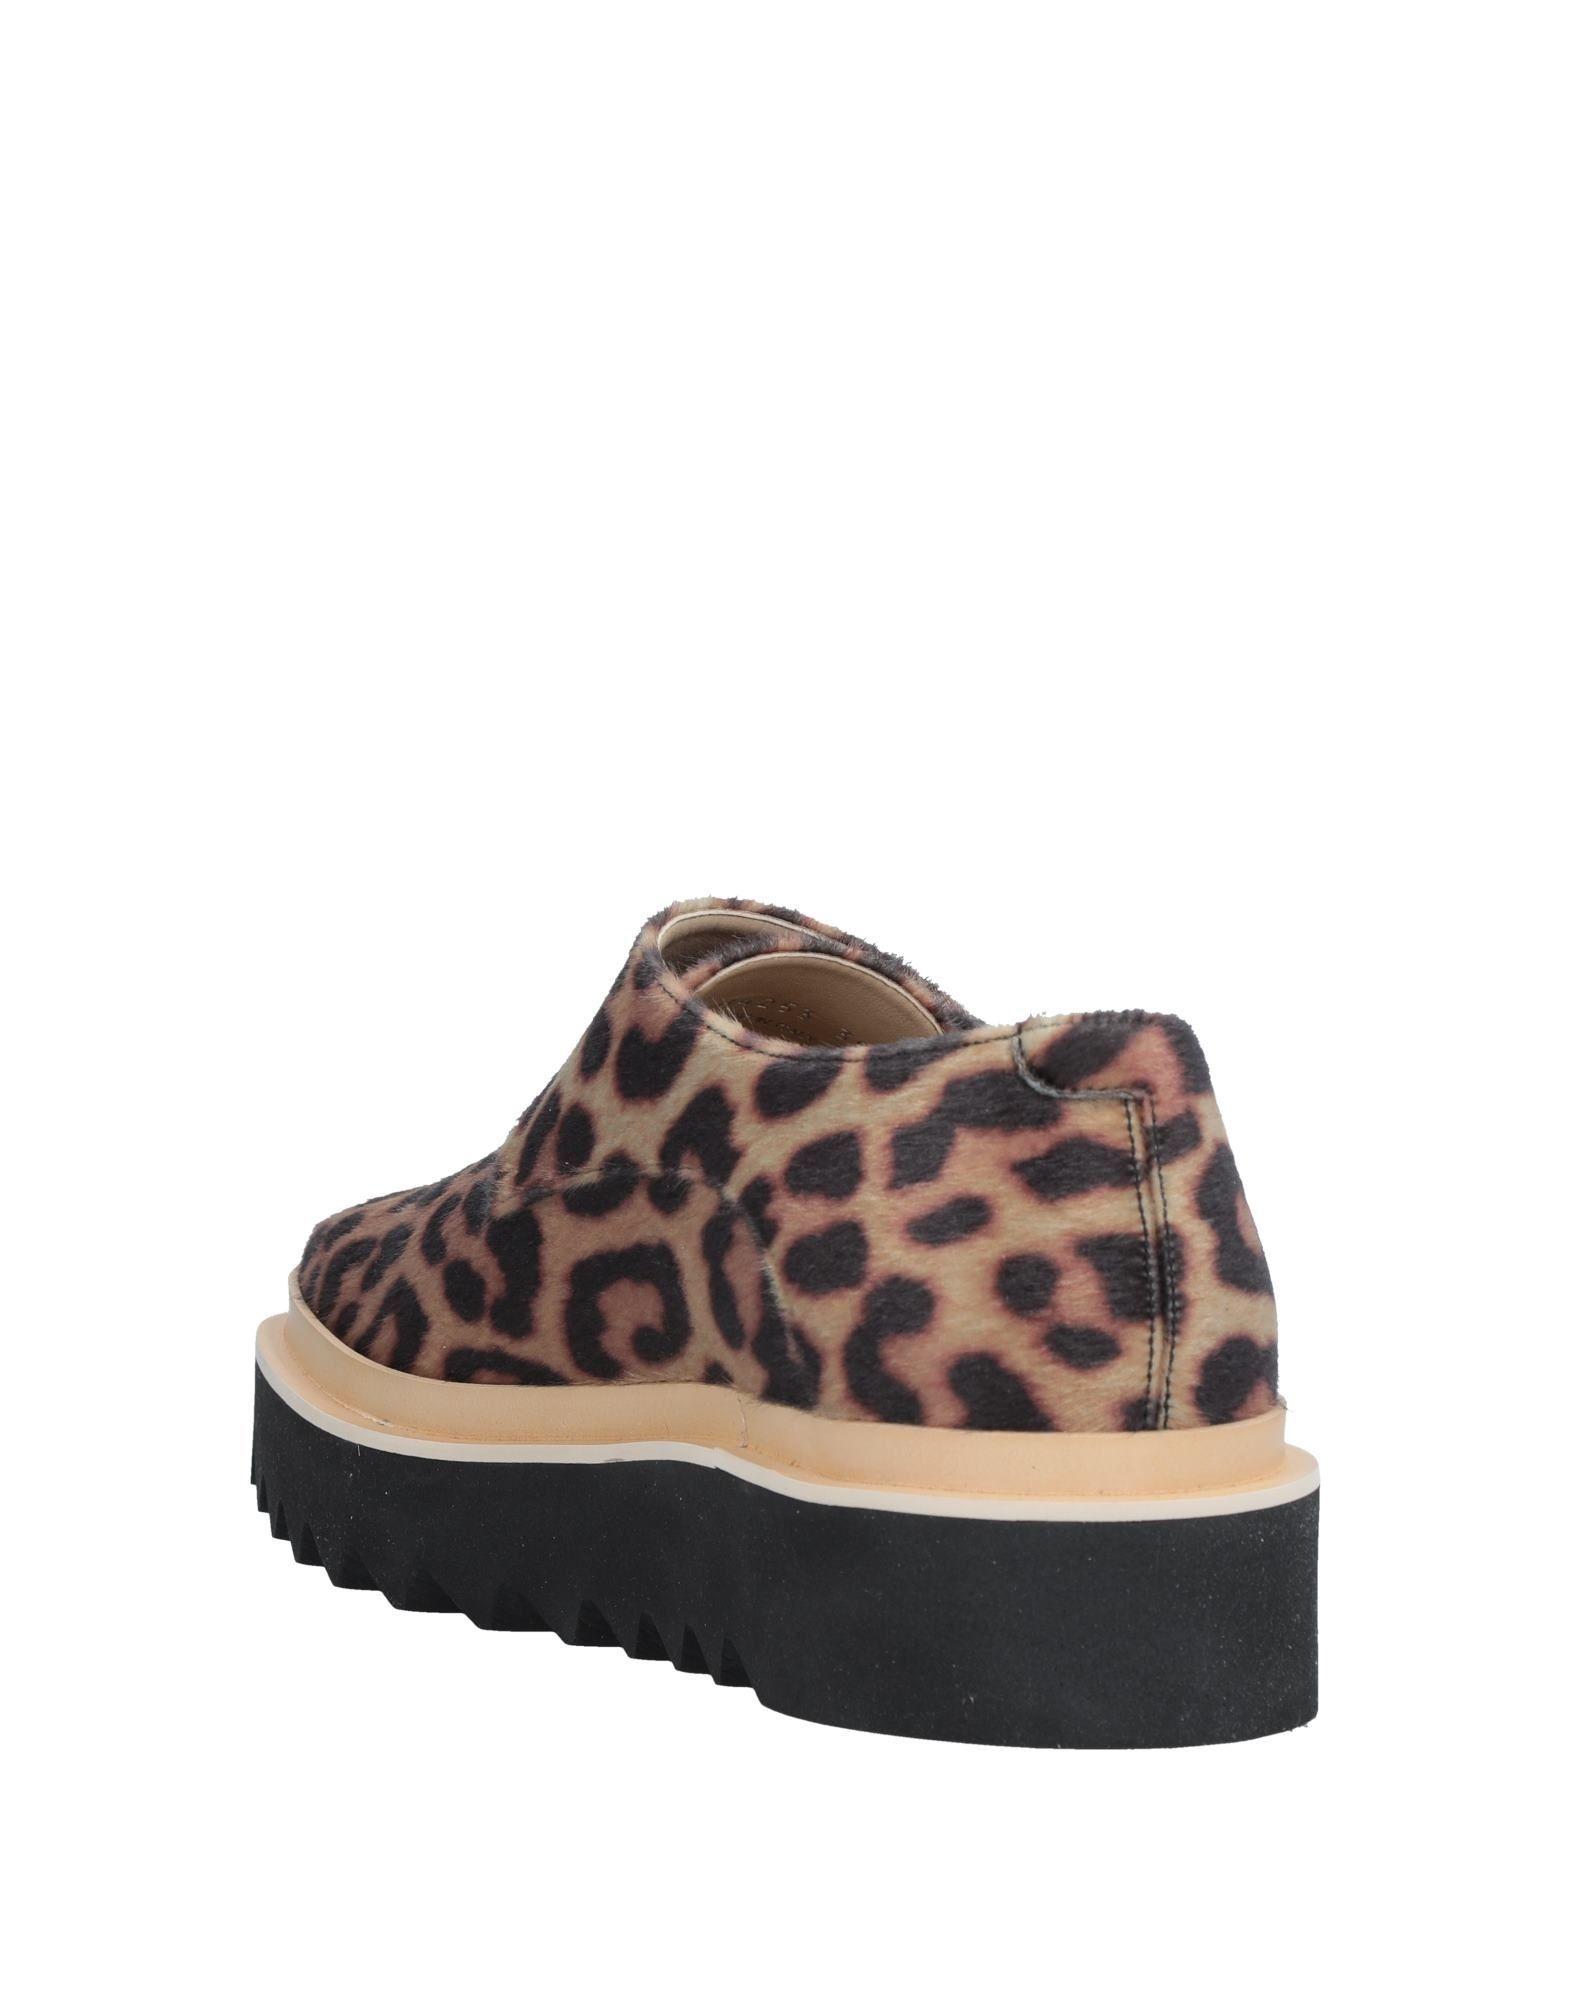 Stella McCartney Leopard Print Double Monkstrap Shoes